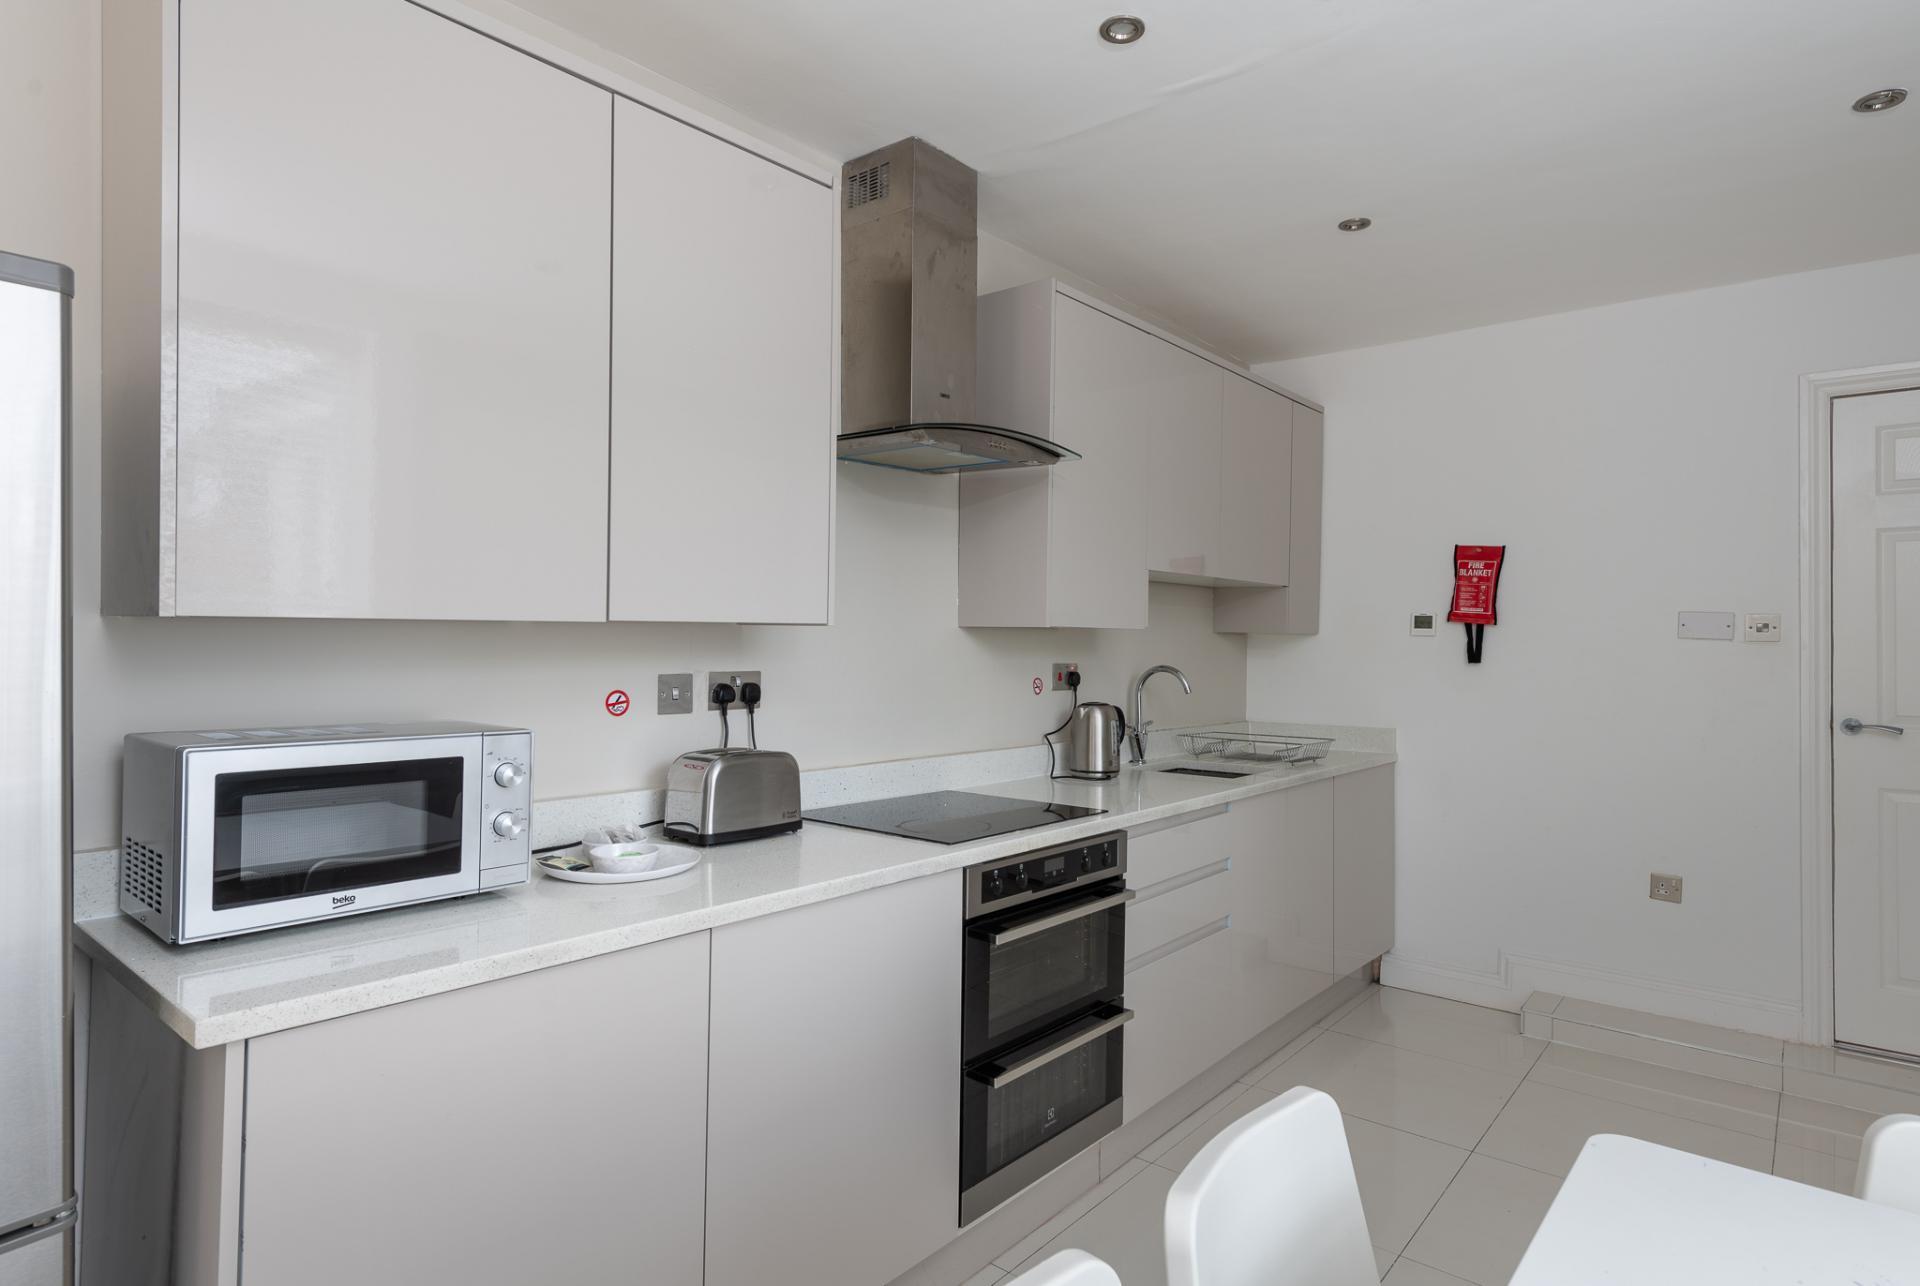 Kitchen at Edgbaston Apartments, Rotton Park, Birmingham - Citybase Apartments